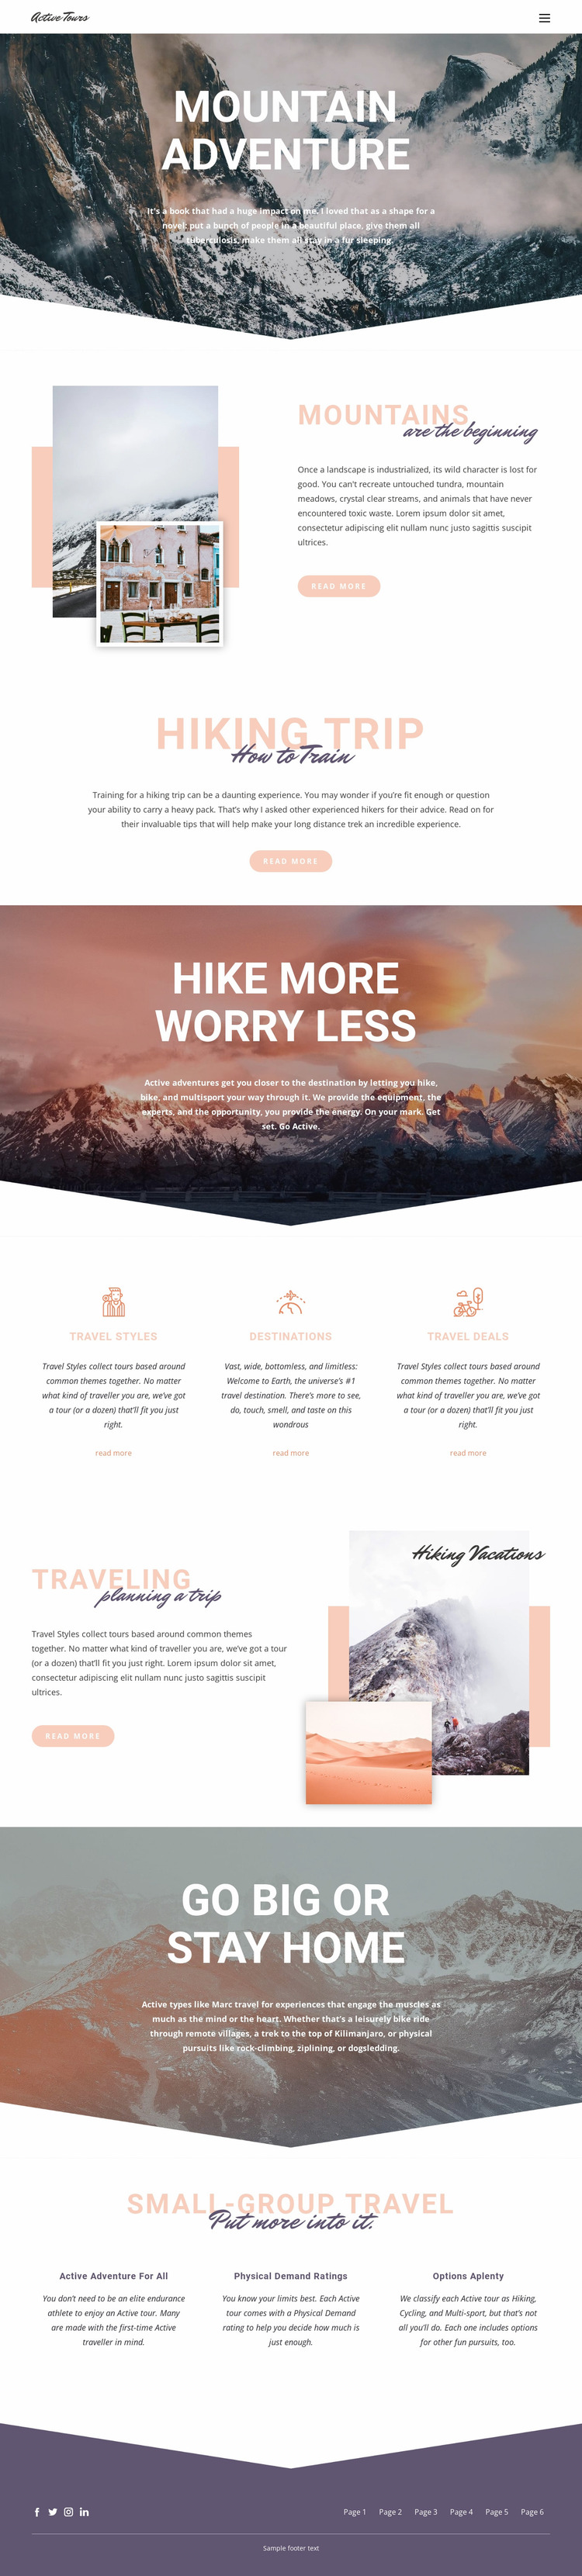 Mountain Adventure Website Mockup